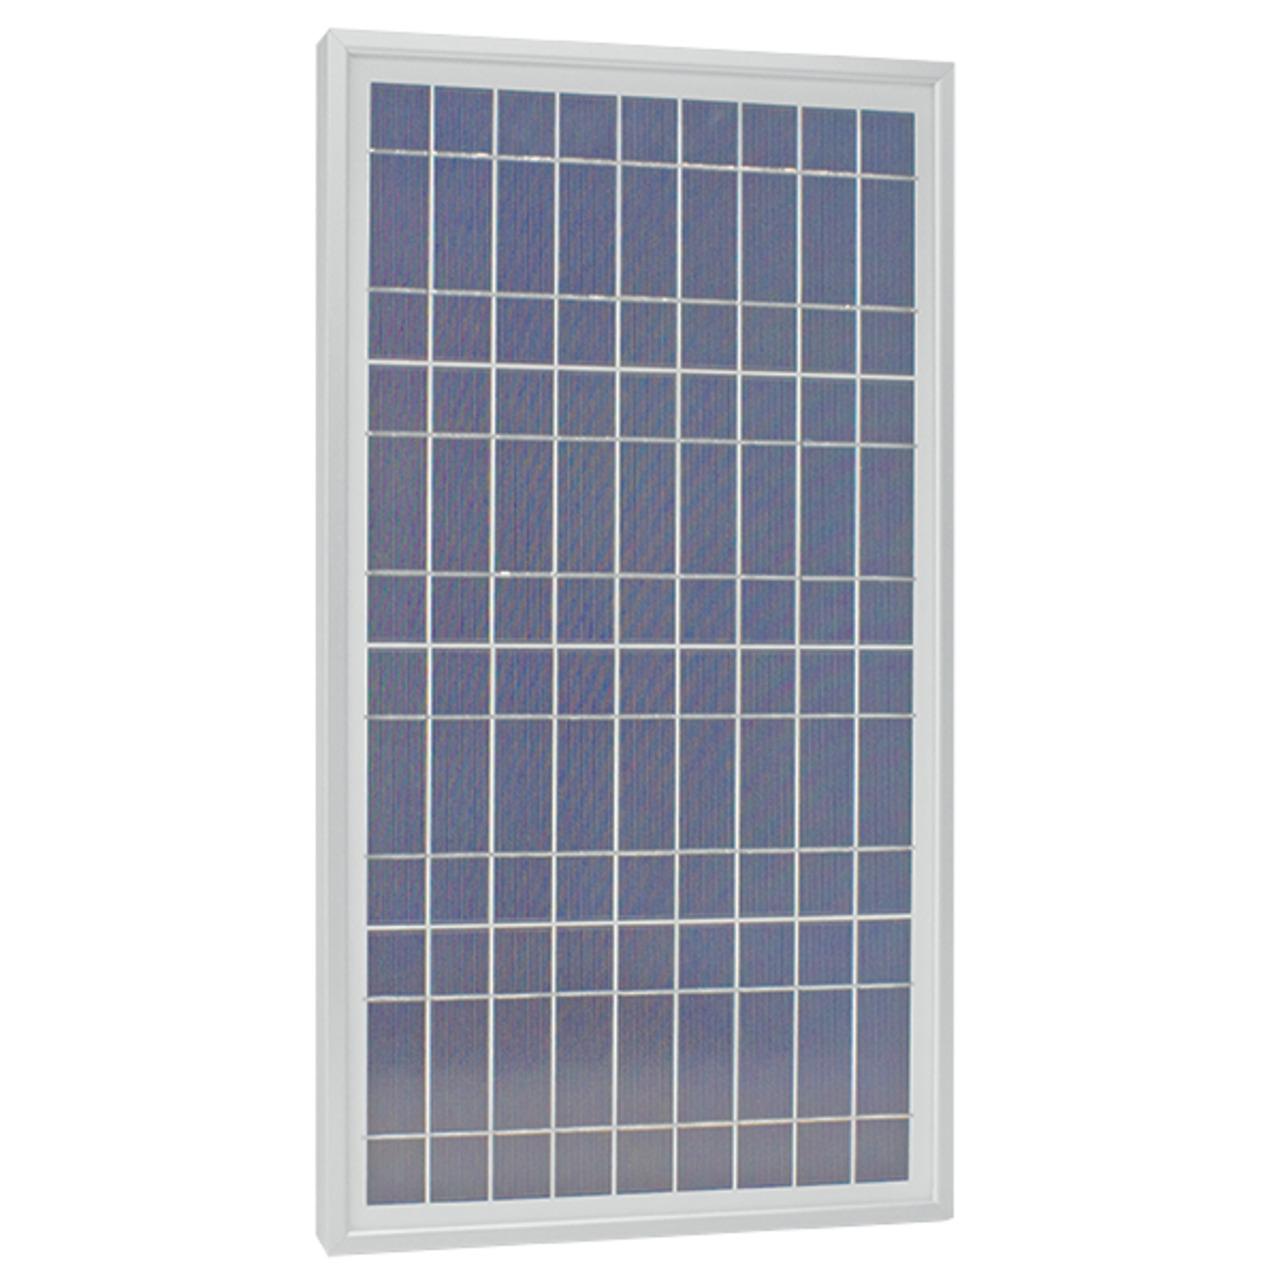 Phaesun Monokristalline Solarmodul Sun Plus 20 S- 12 V- 20 W